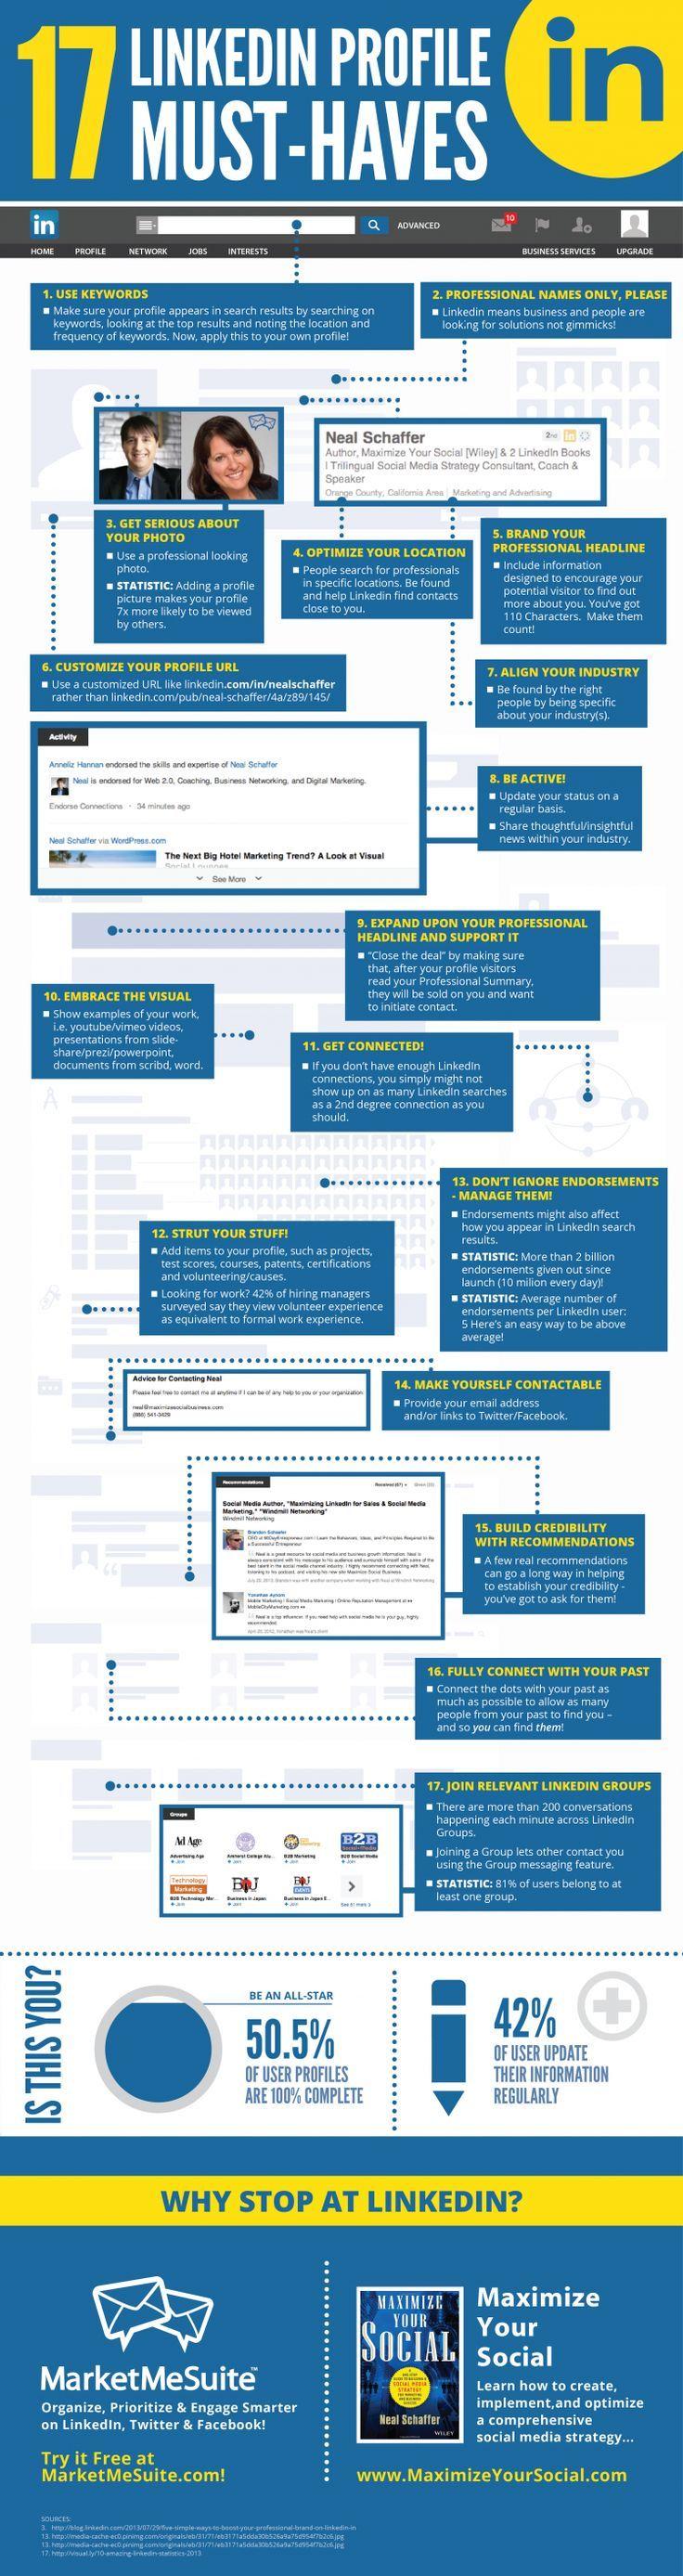 Linkedin profile musthaves social media infographic